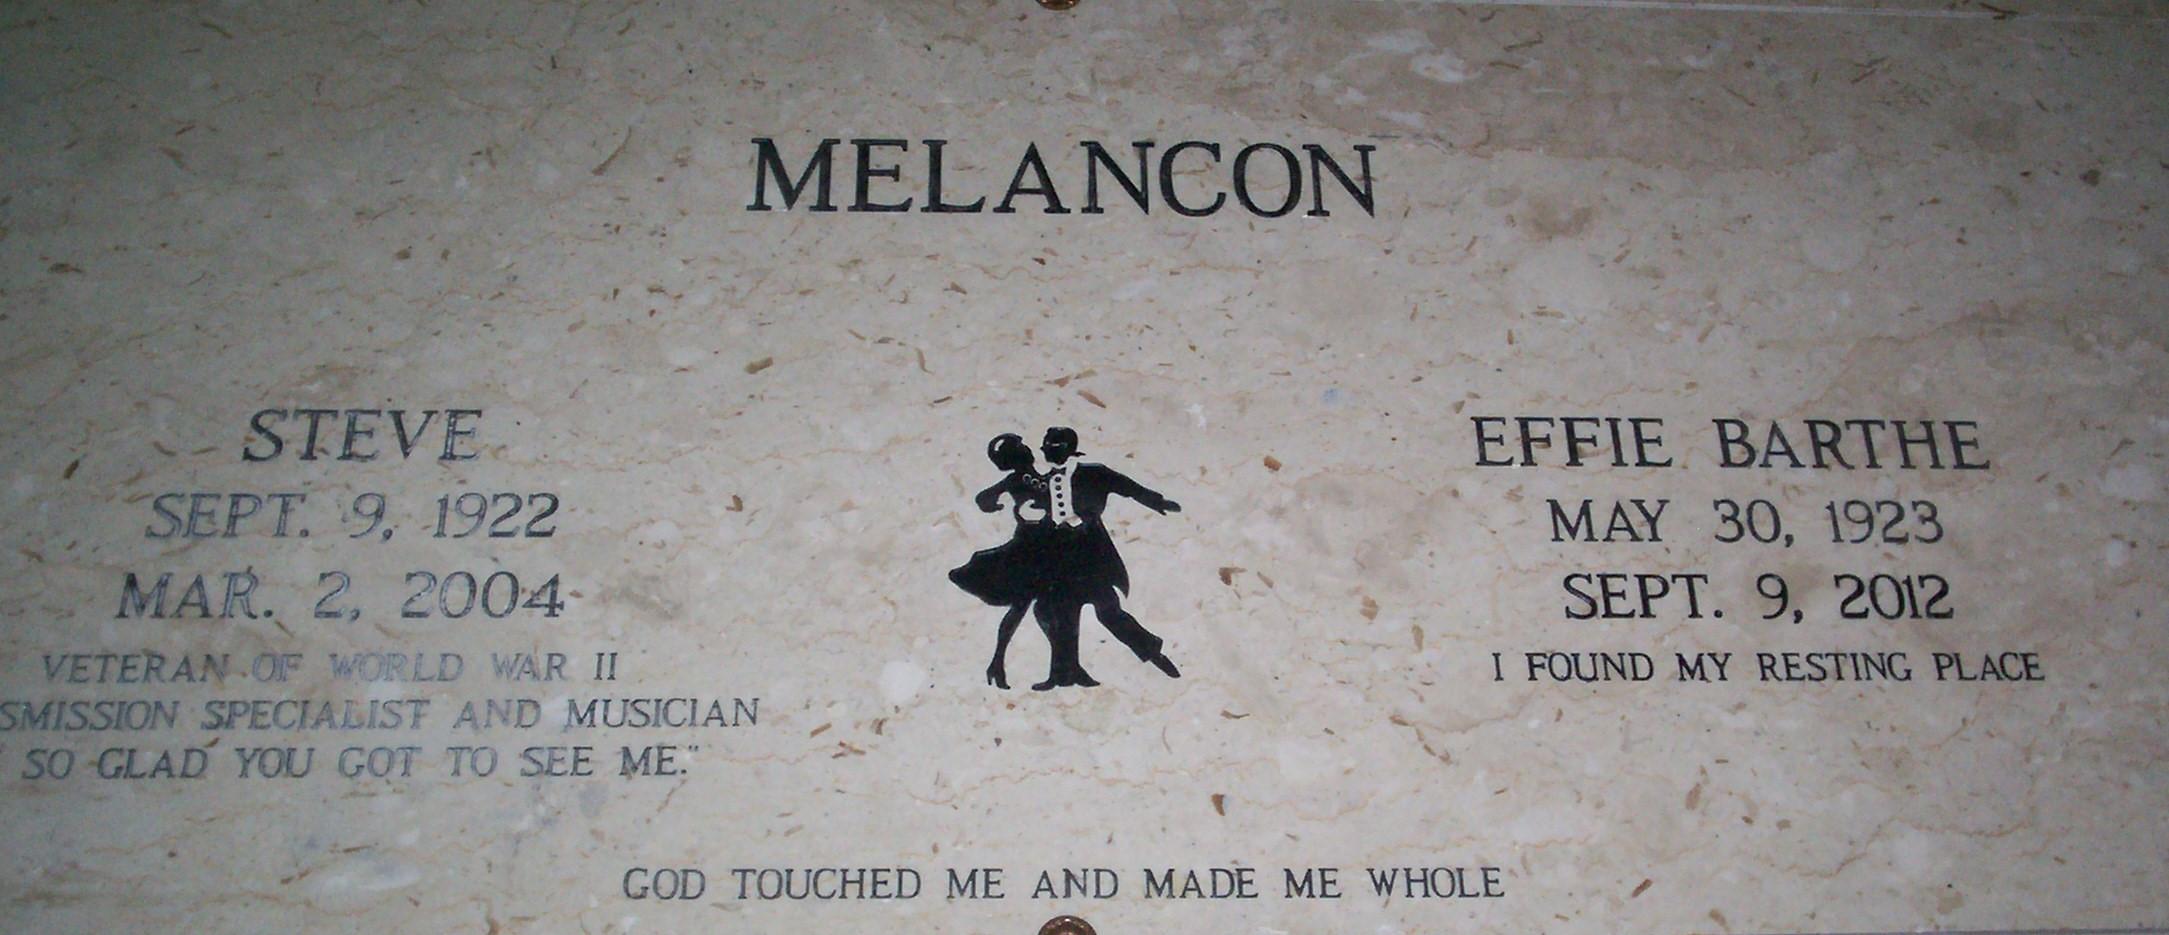 Effie Barthe Melancon Find A Grave Memorial